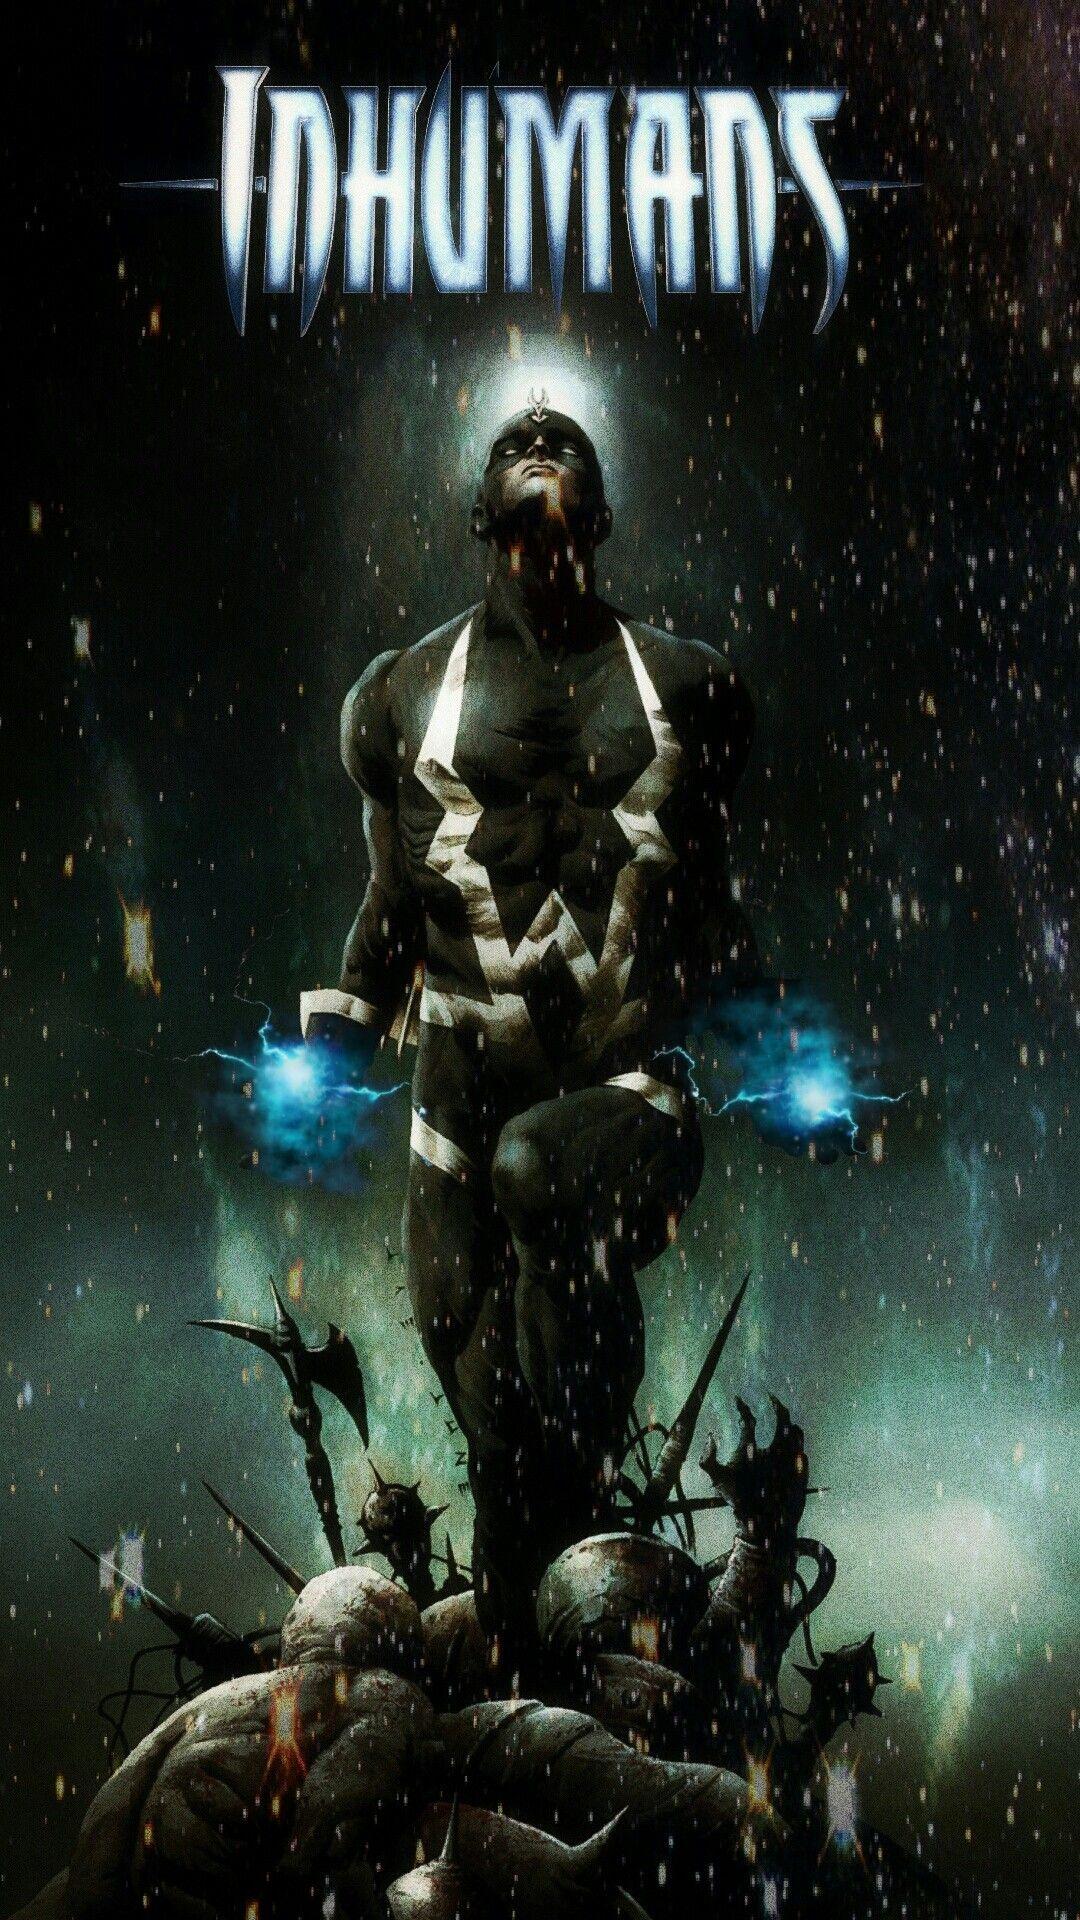 Black Bolt Marvel's Inhumans Iphone Wallpaper Black bolt